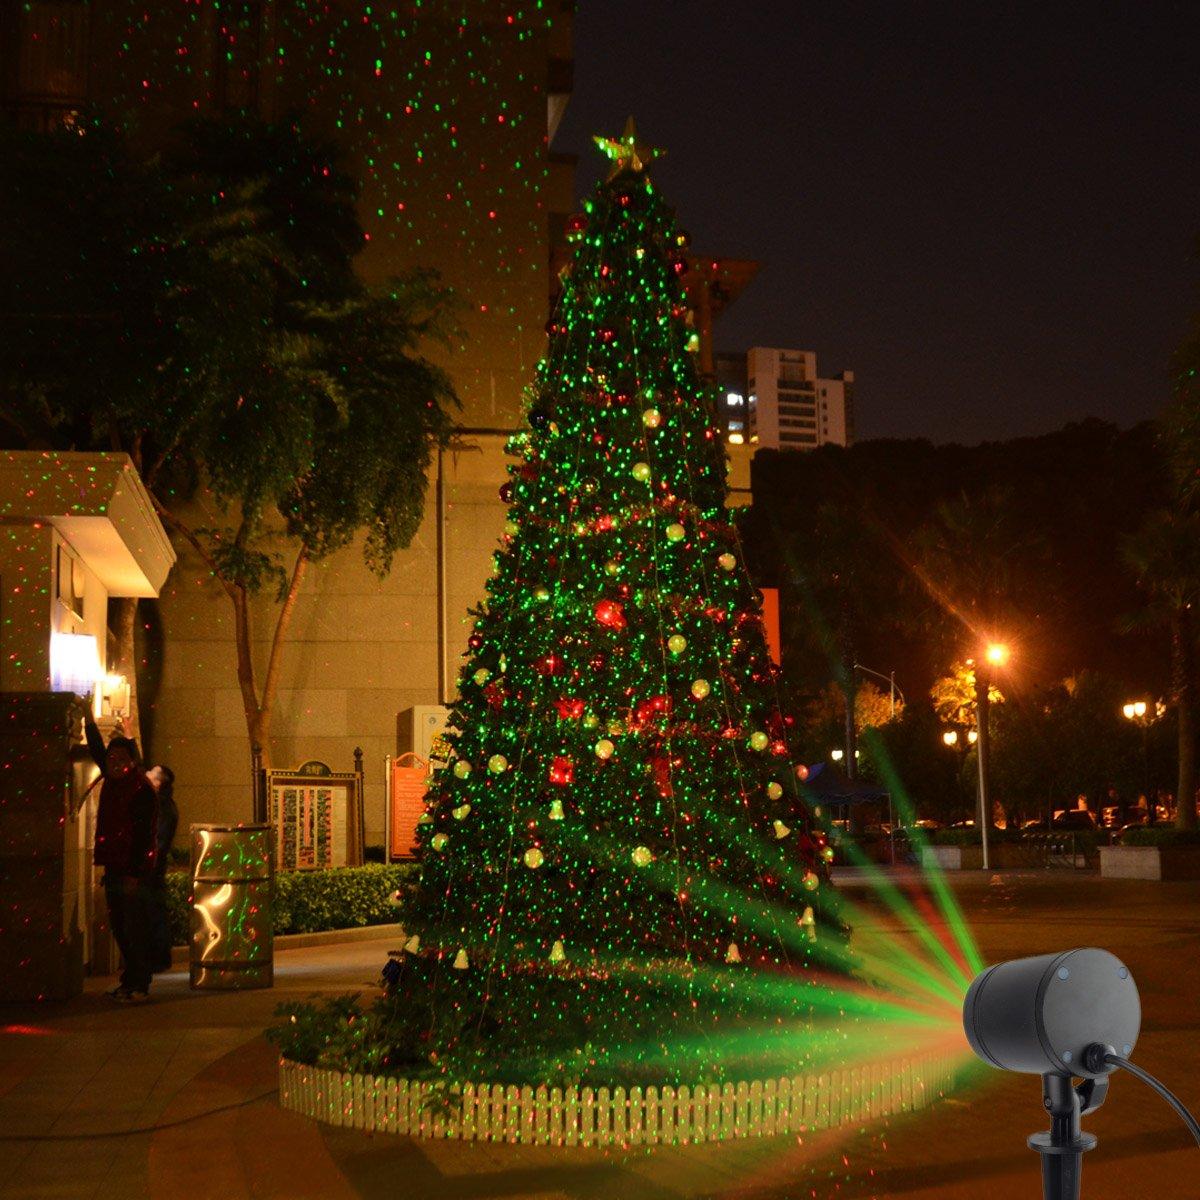 Starry Laser Lights Projector Lights Outdoor Waterproof Laser Lamp ...